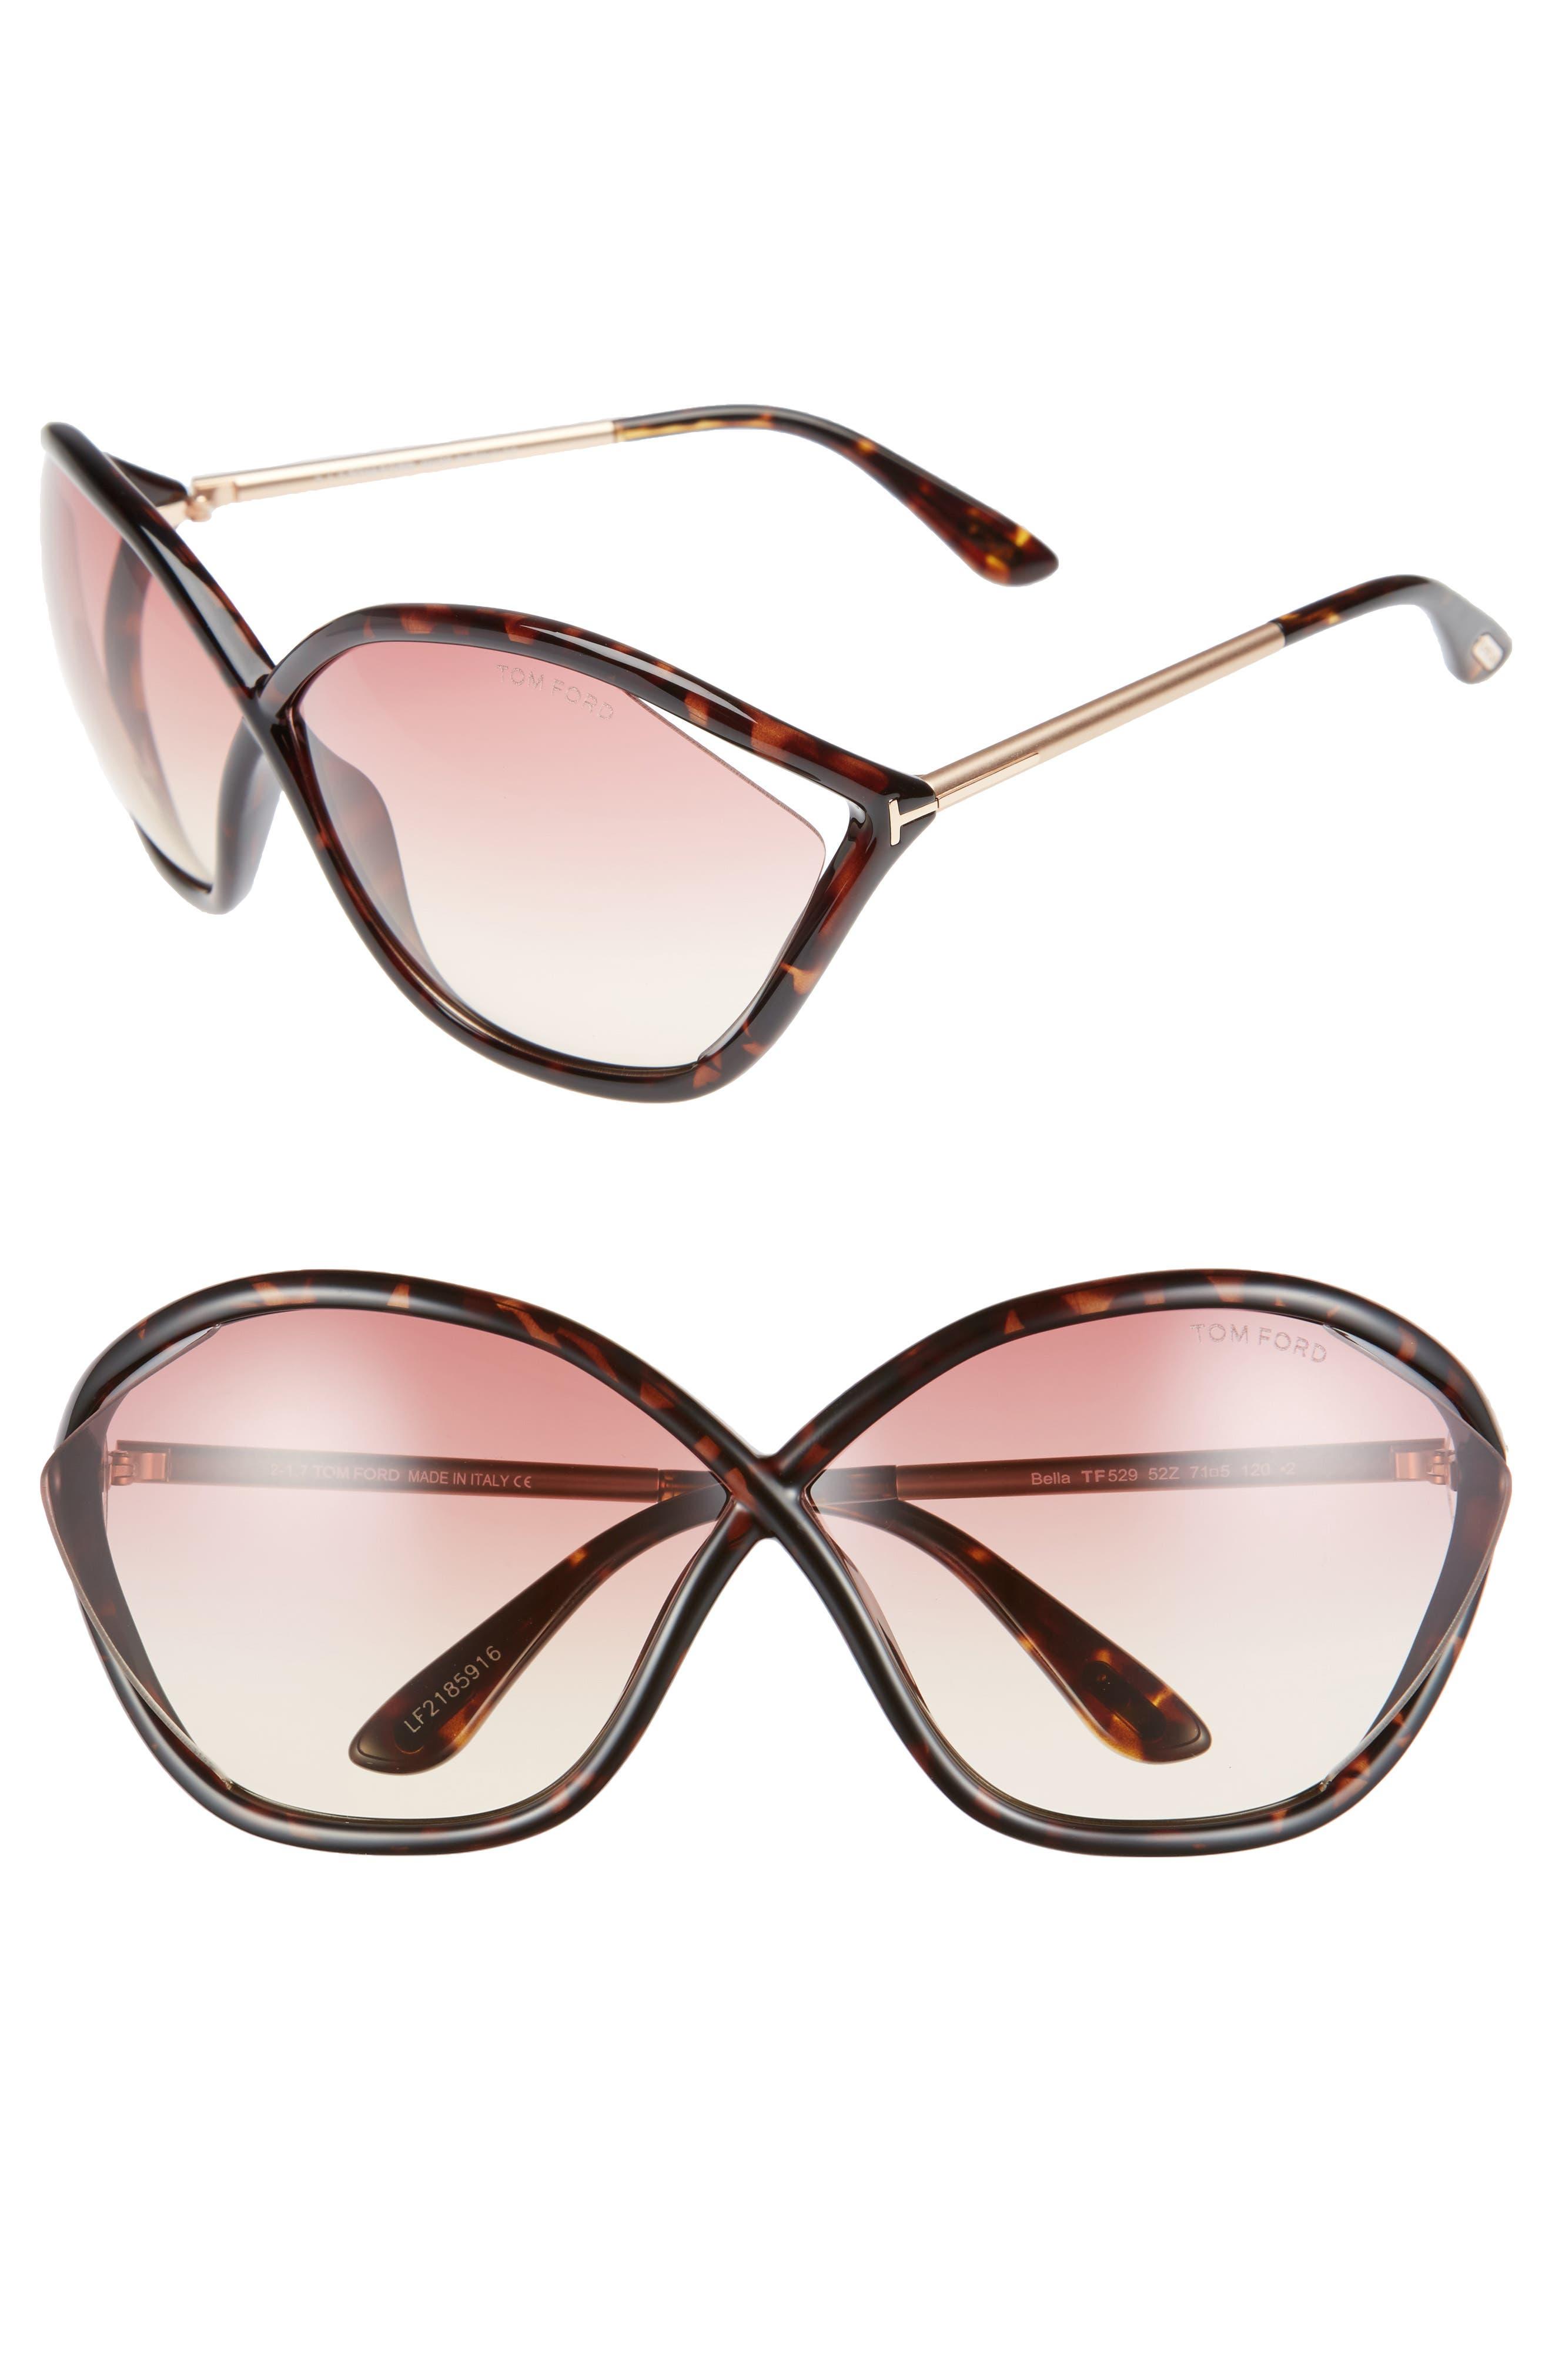 Bella 71mm Gradient Lens Sunglasses,                         Main,                         color, Dark Havana/ Violet